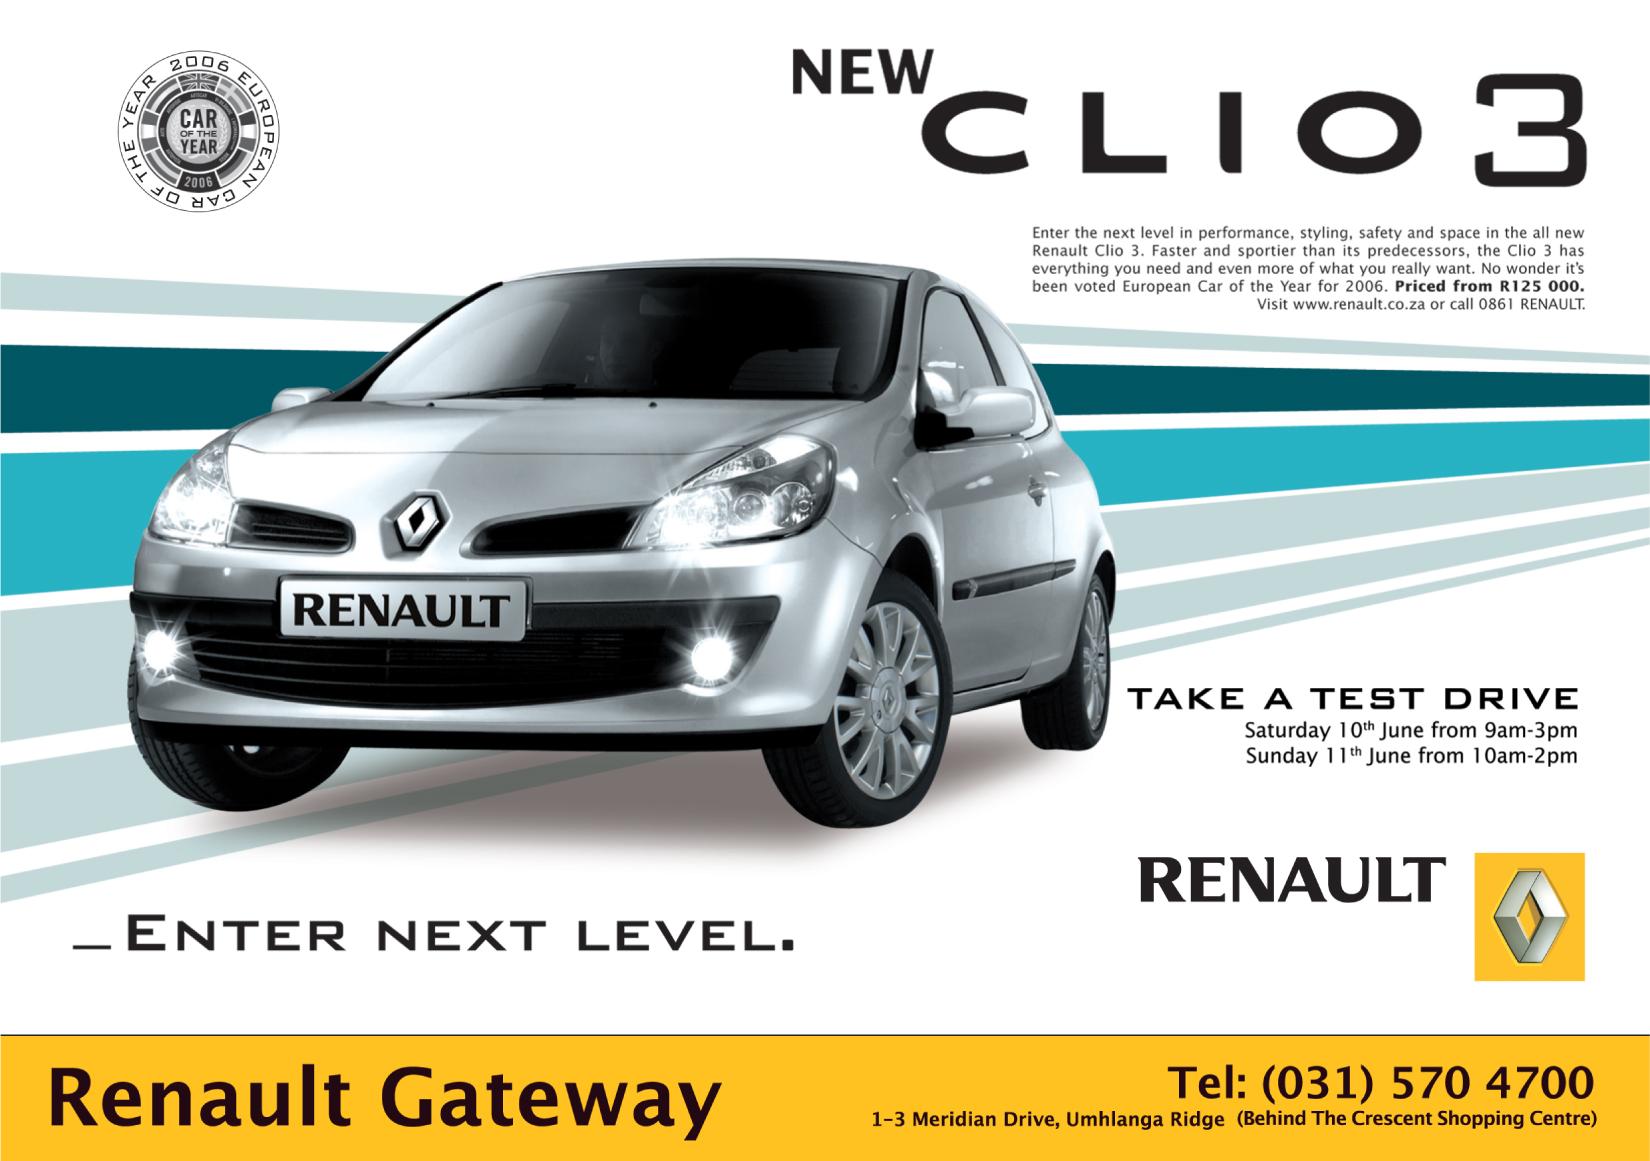 Portfolio image for Renault (campaign 2)